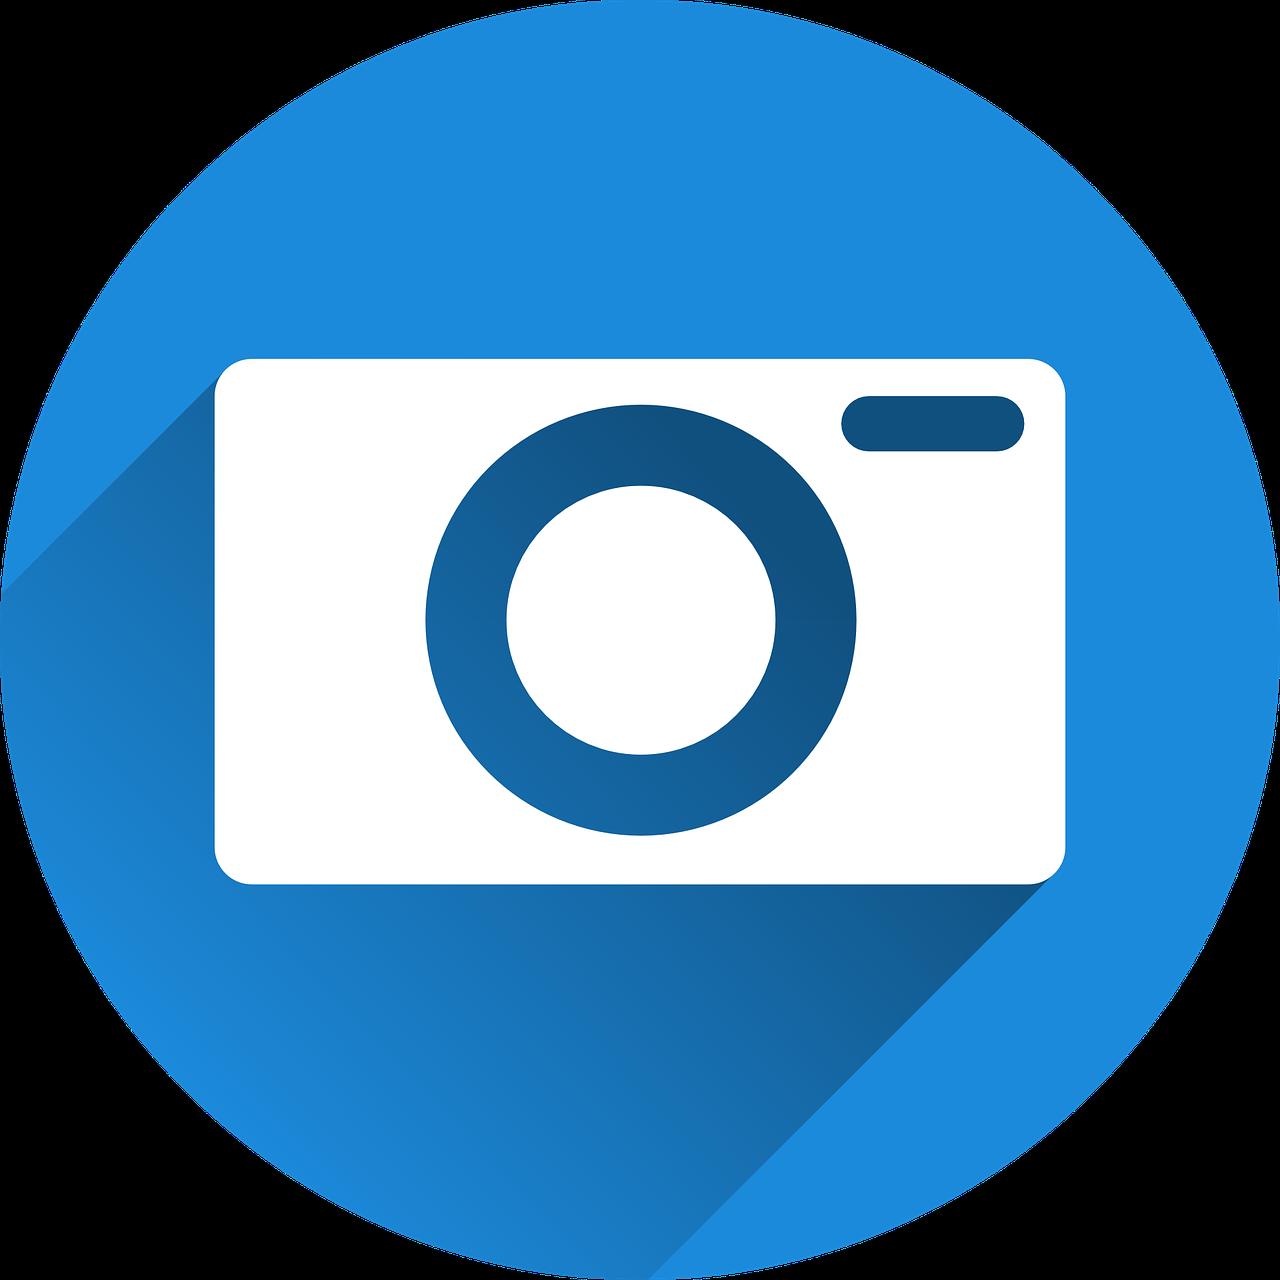 camera, photo, image